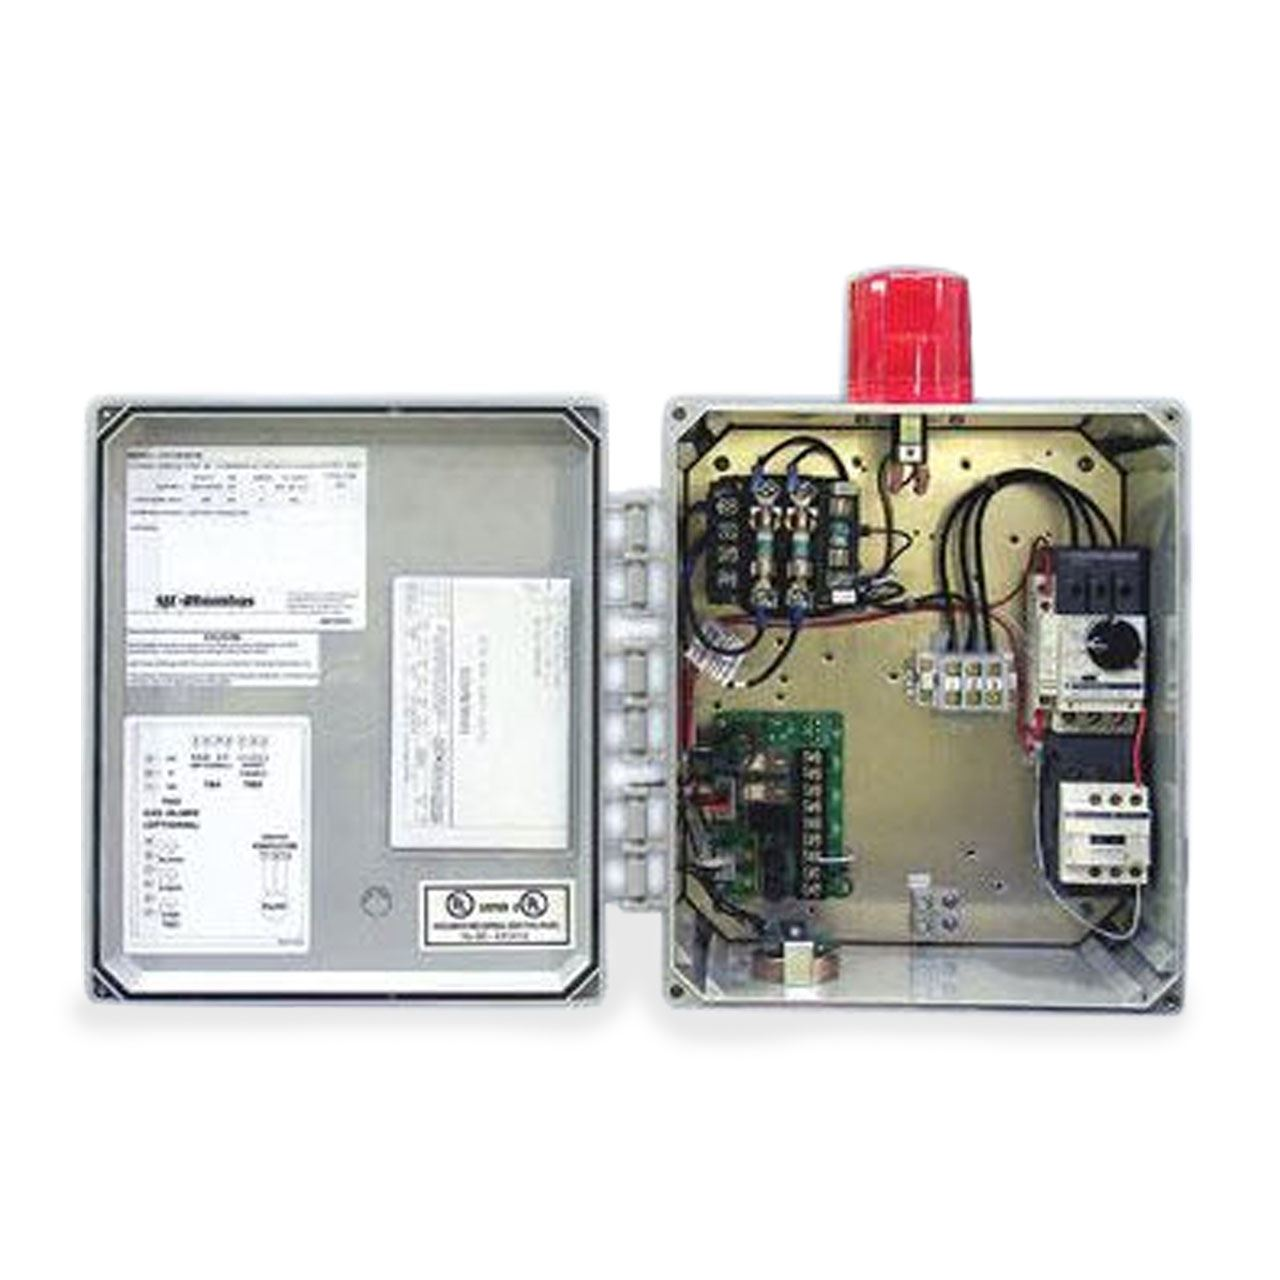 Pump Panel Wiring Diagram Simplex - Library Of Wiring Diagram •